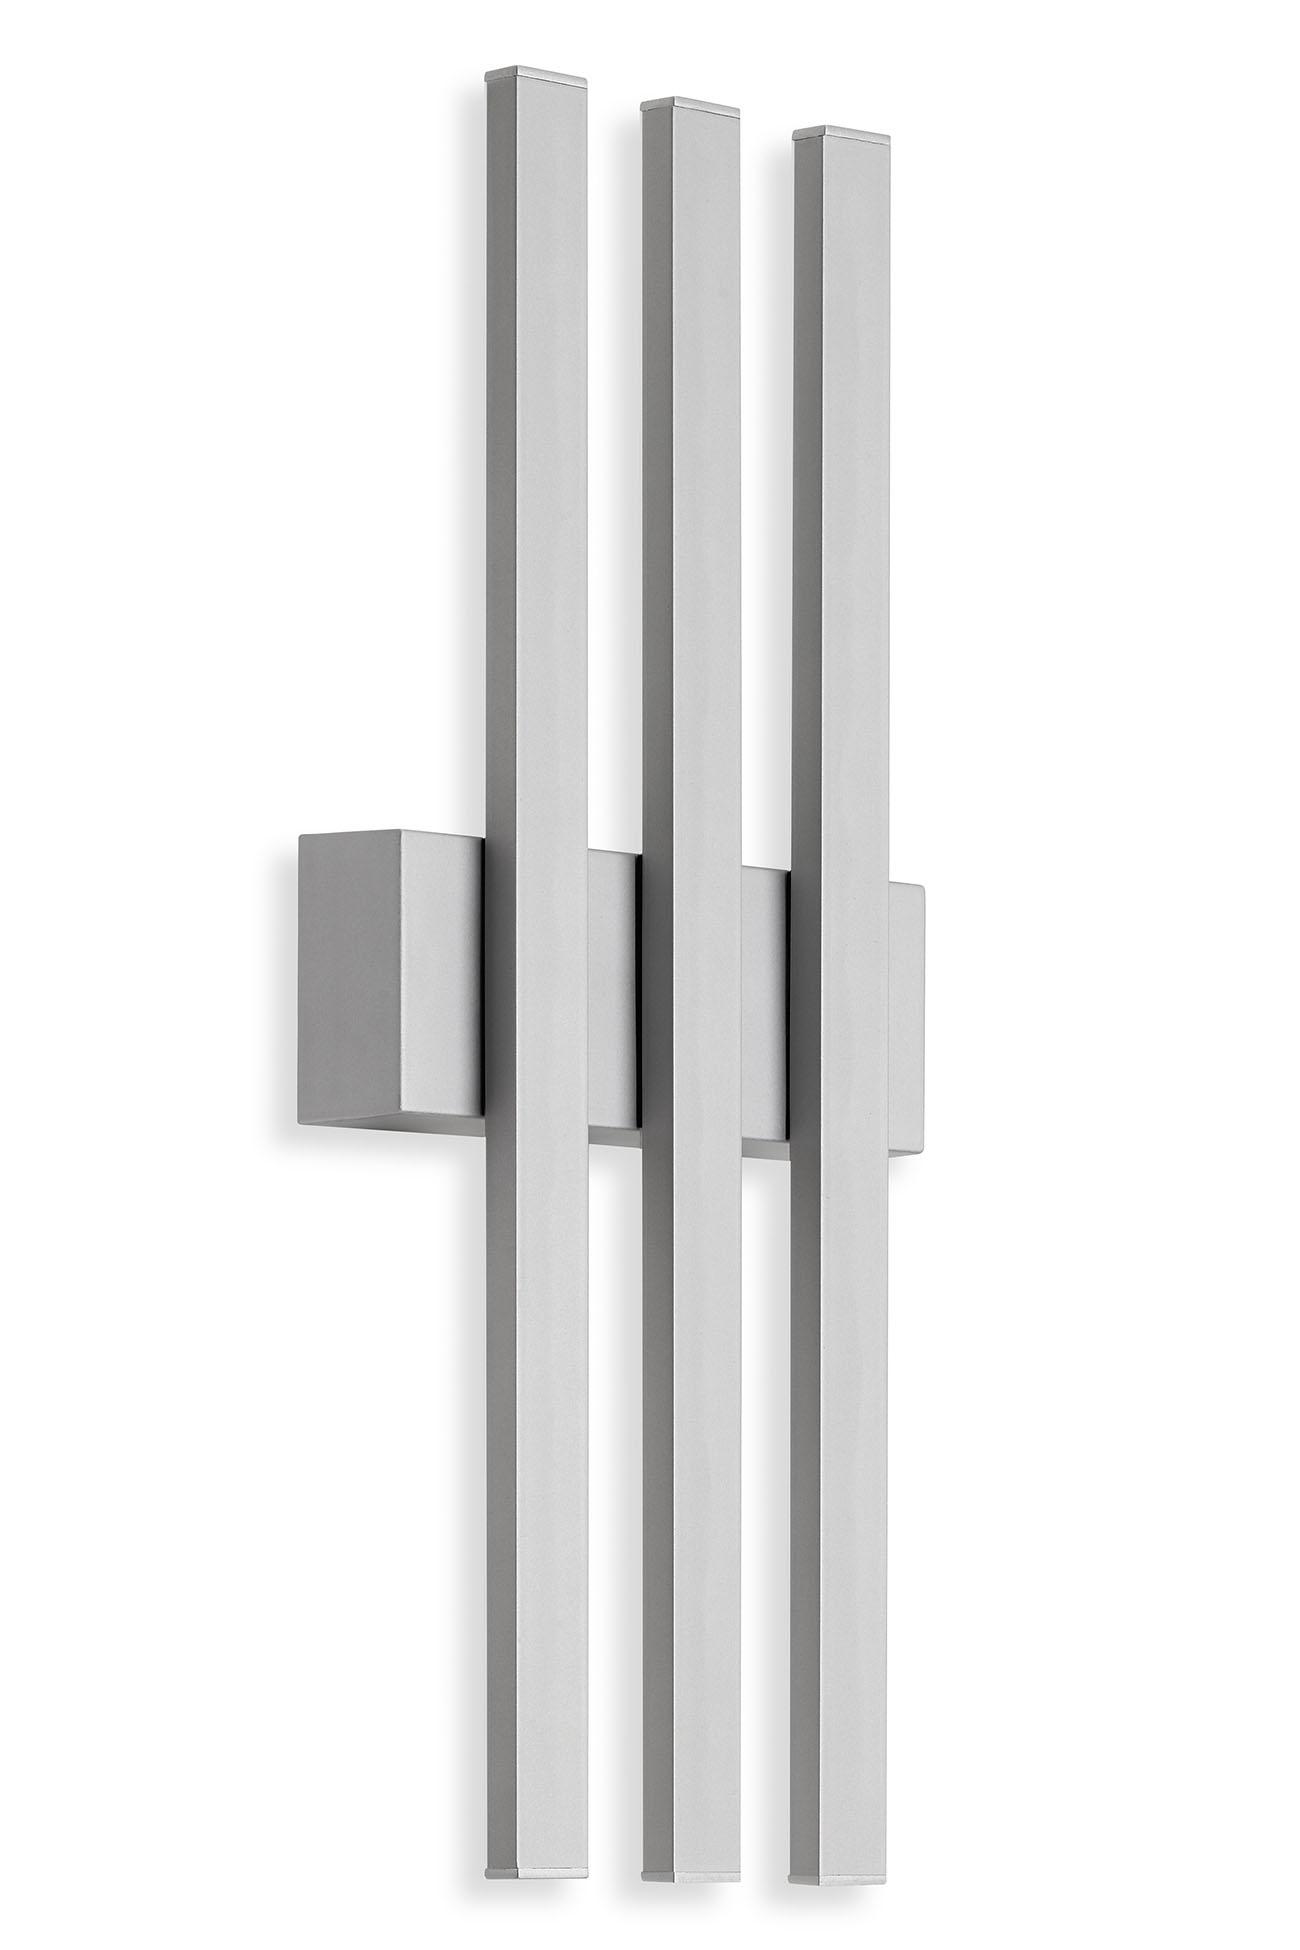 TELEFUNKEN LED Aussenwandleuchte, 37 cm, 12 W, Silber